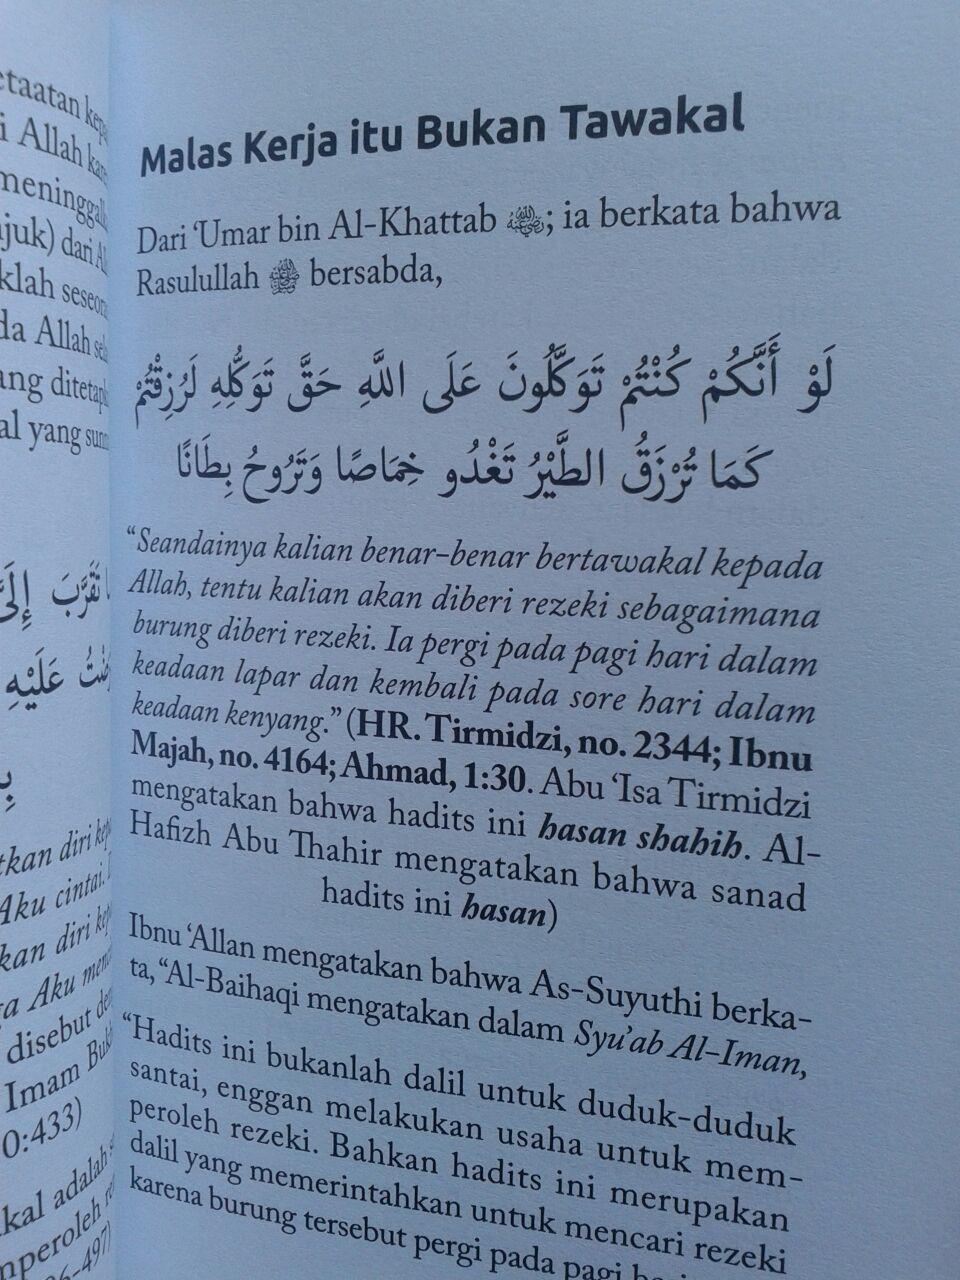 Buku Amalan Pembuka Pintu Rezeki Dan Kiat Memahami Rezeki isi